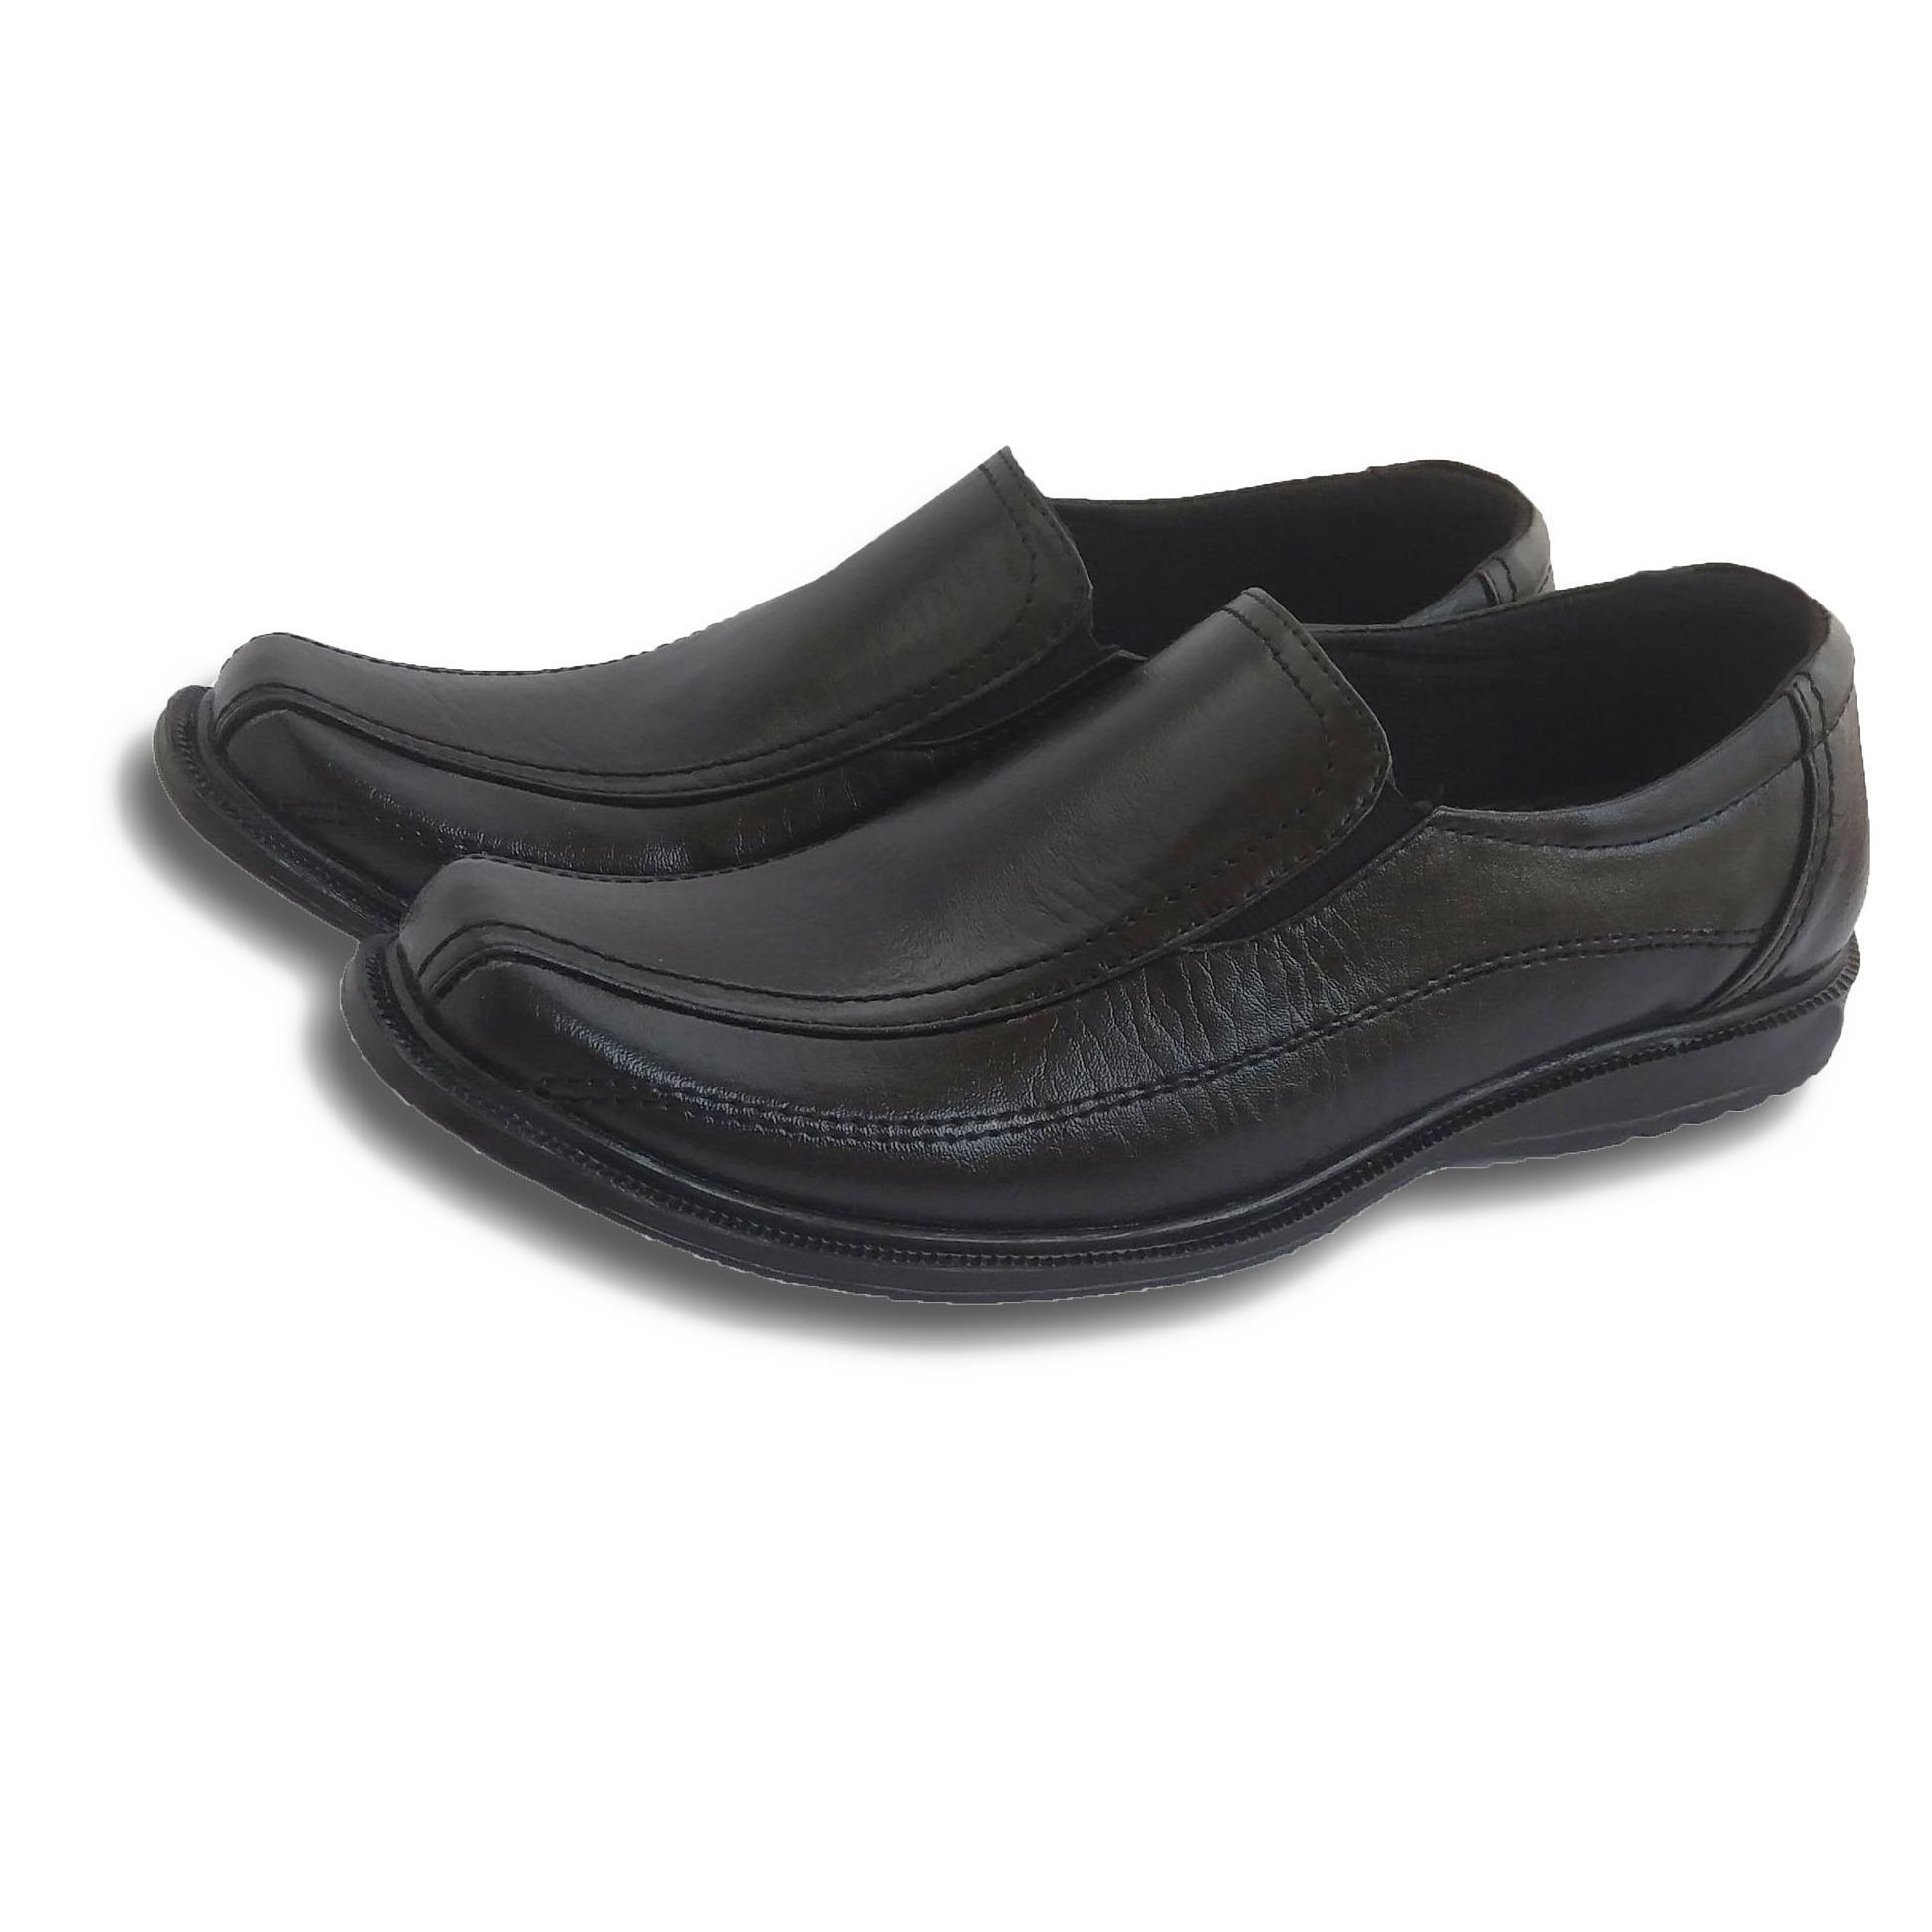 HLR Sepatu Formal pria / sepatu formal / sepatu kerja pria / sepatu pria / sepatu